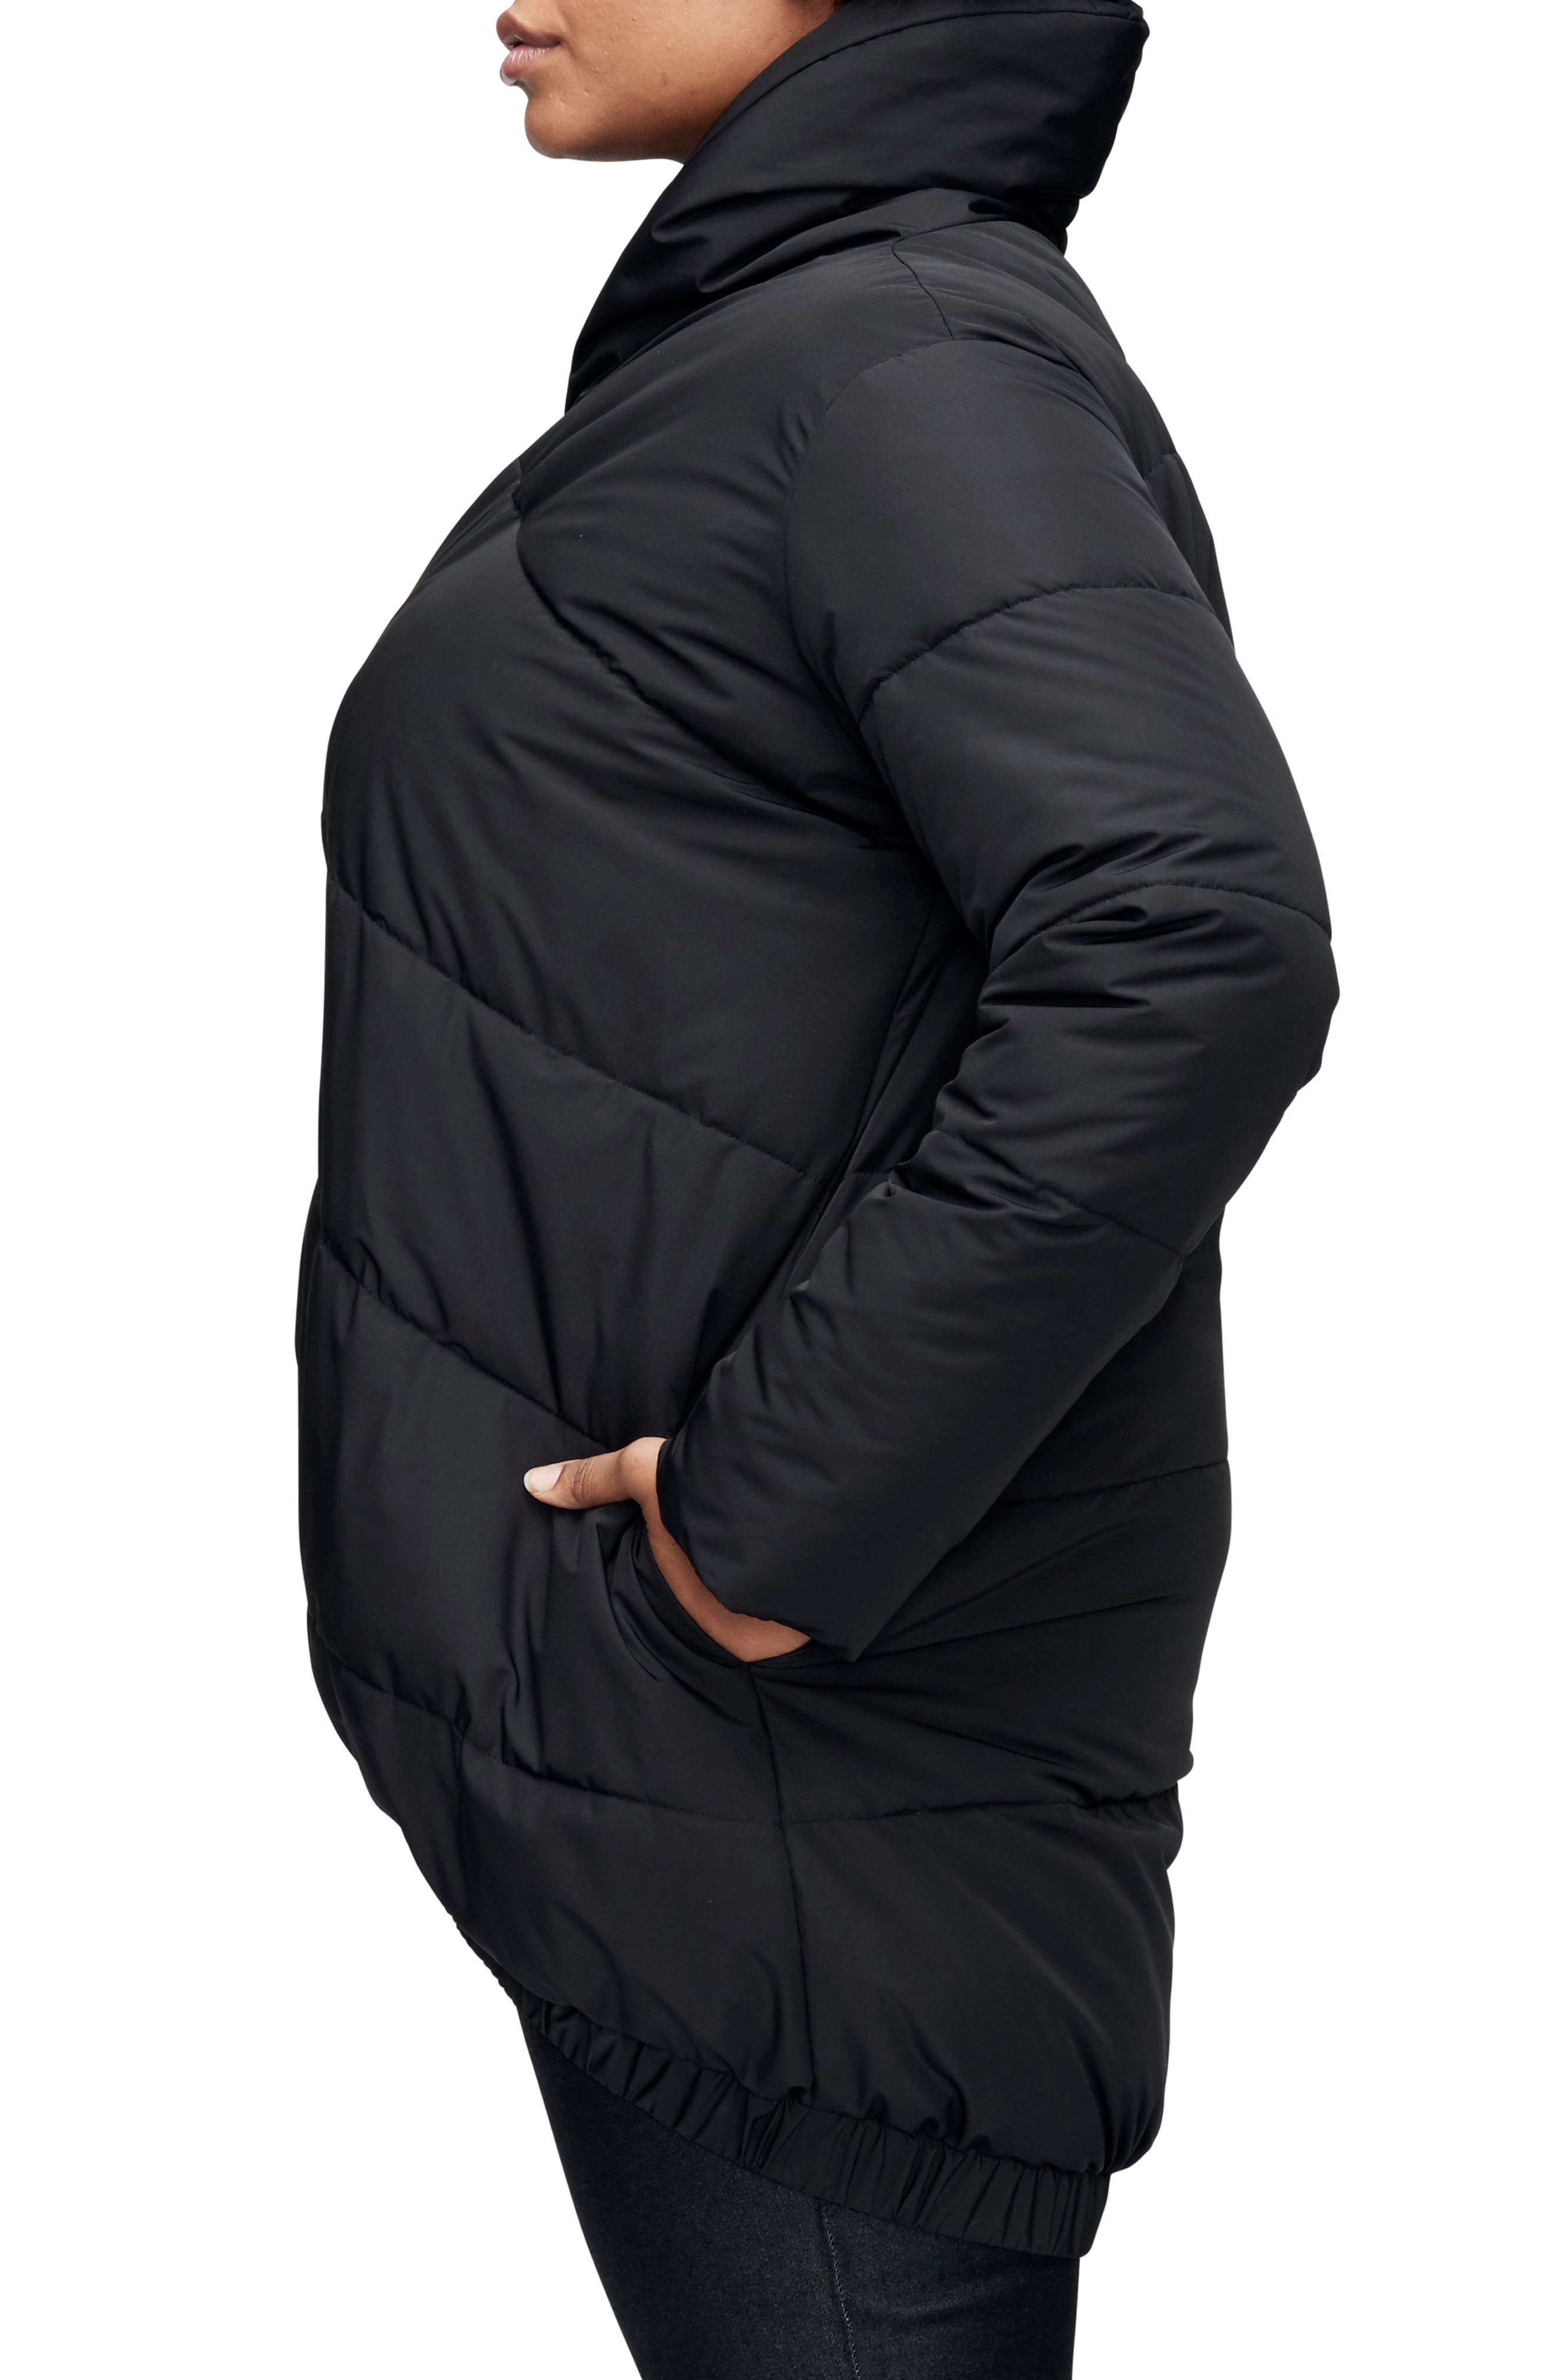 Kanda Puffer Jacket,                             Alternate thumbnail 3, color,                             BLACK